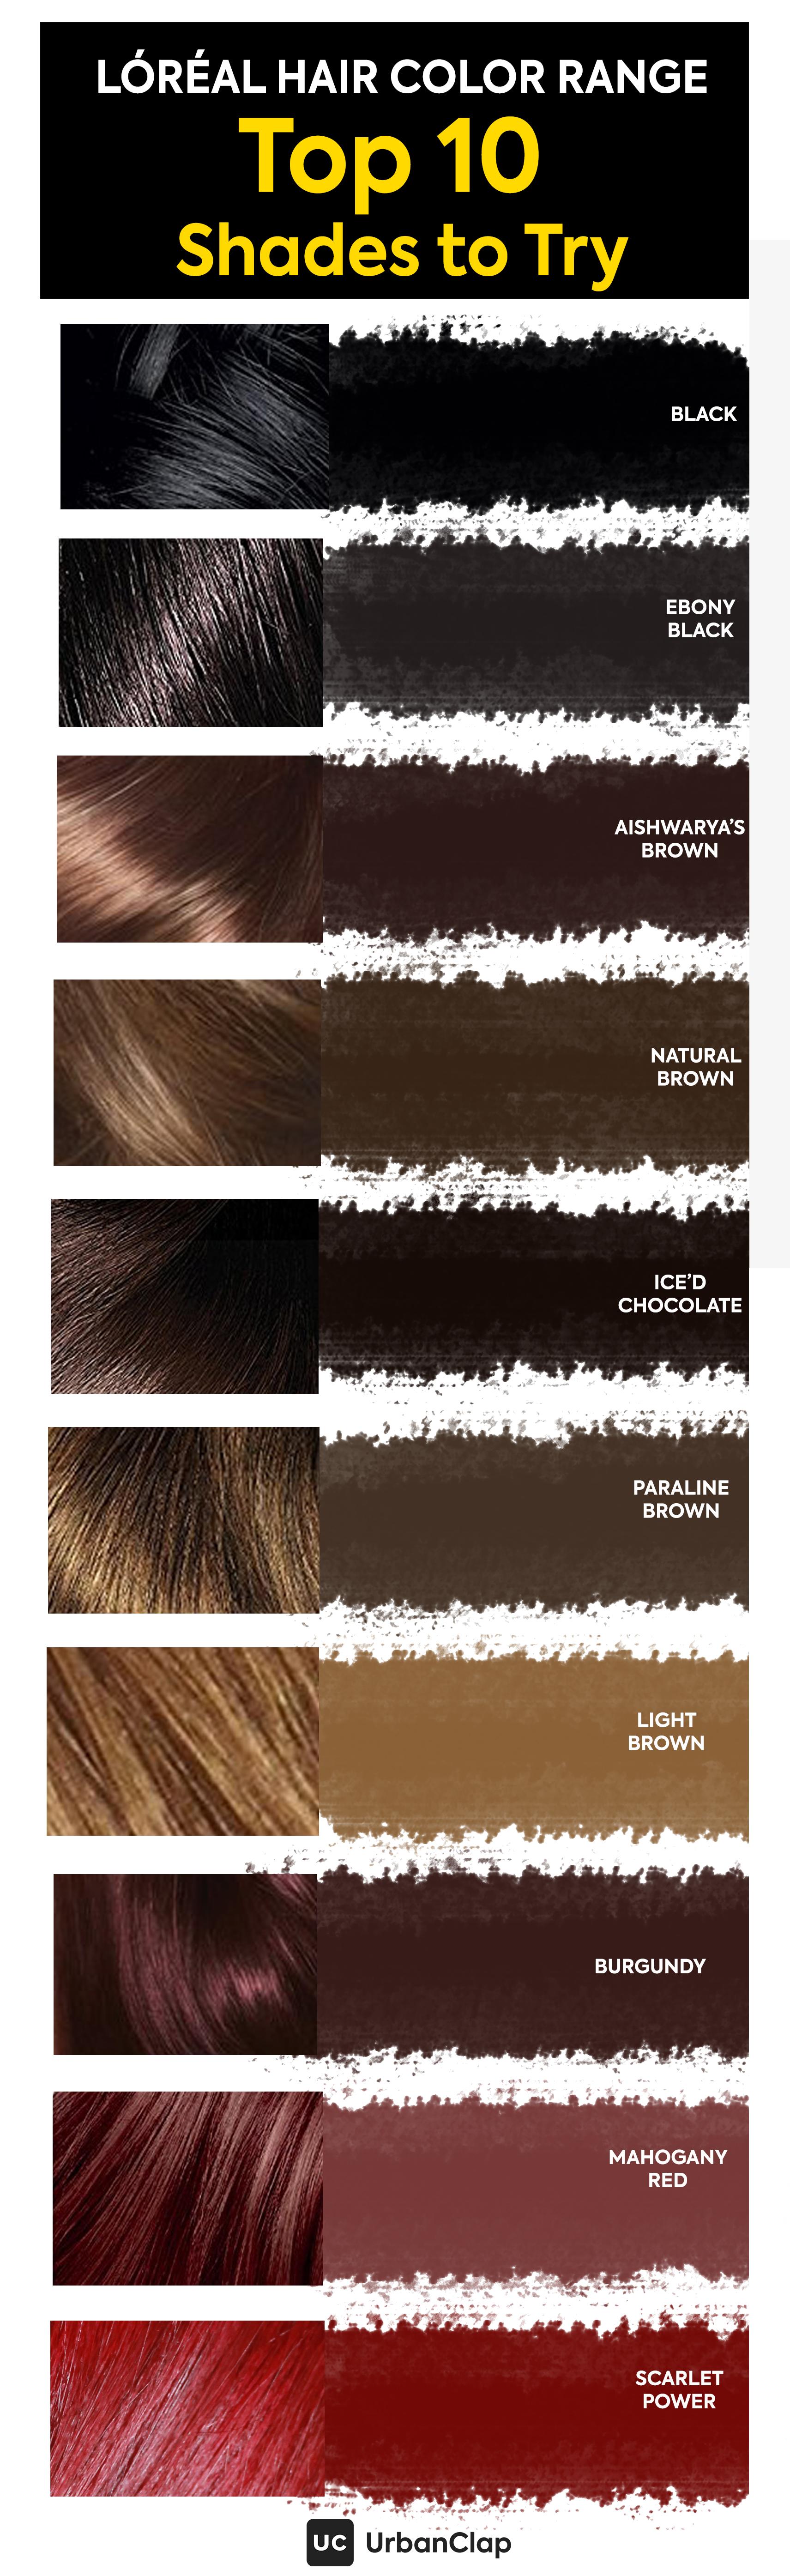 Feria Hair Color Light Golden Brown